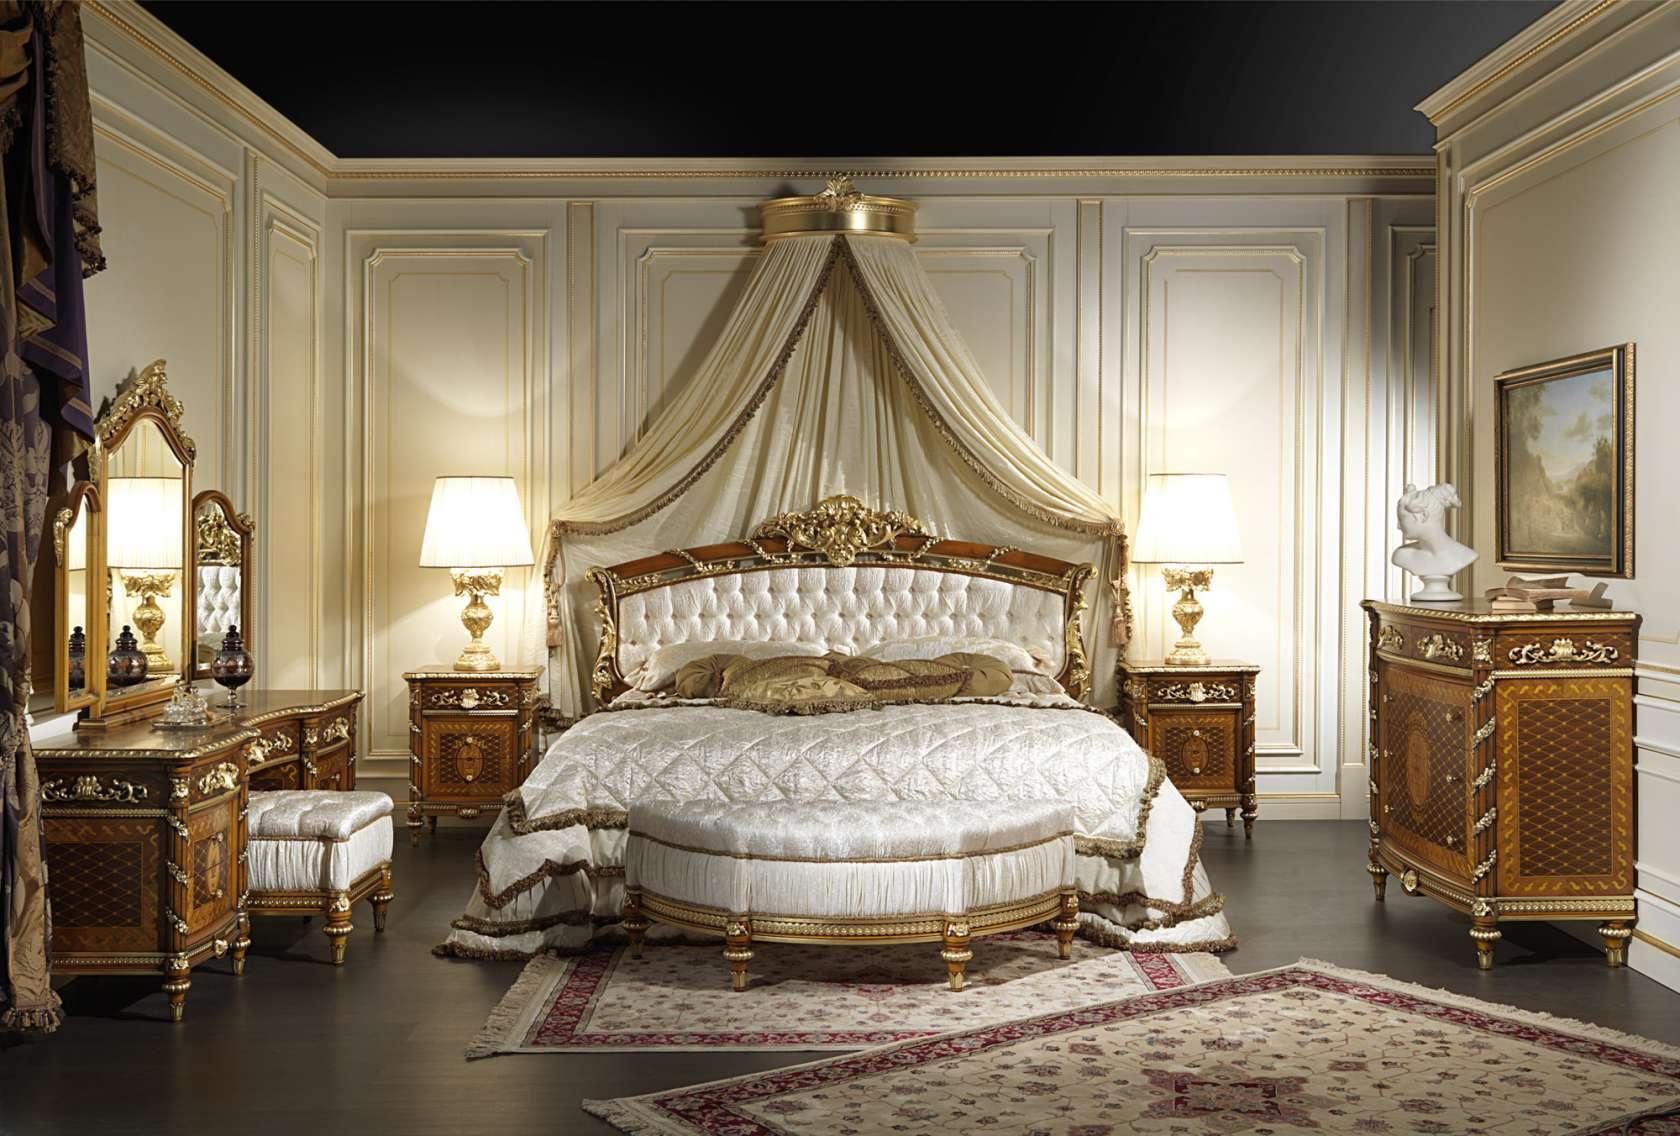 Furniture For Walnut Bedroom Art. 2011